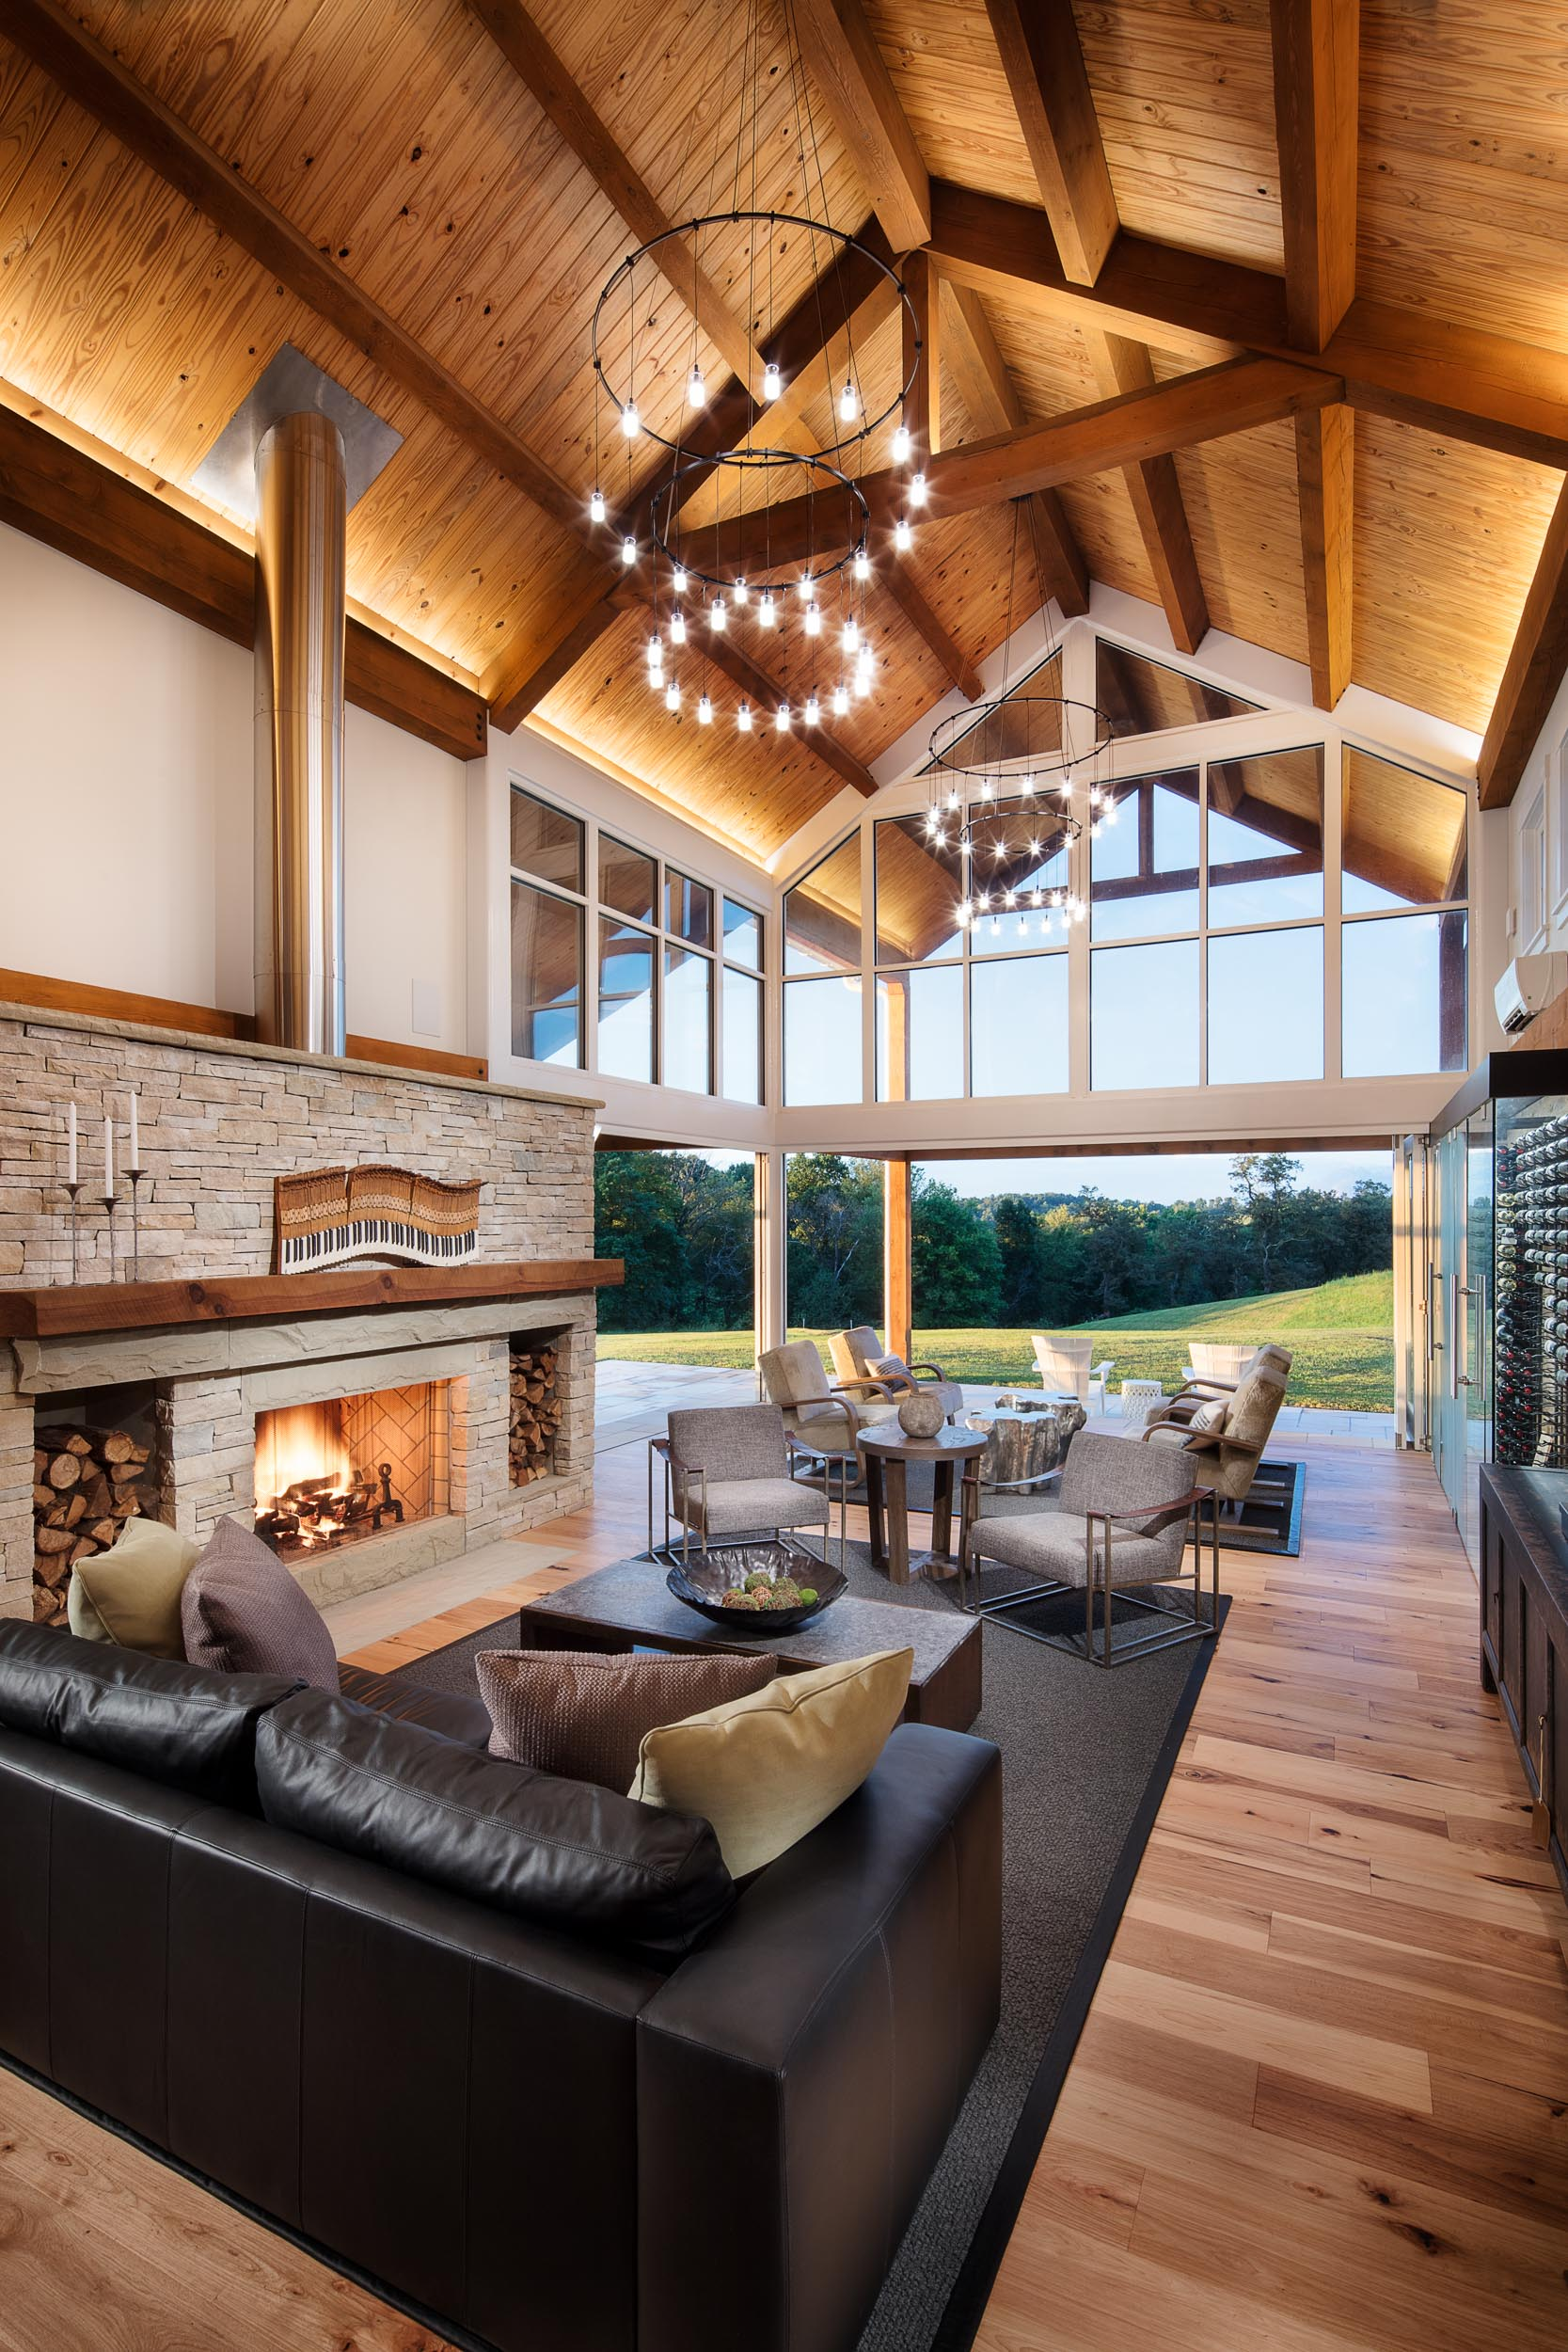 home_barn_upscale_country_grealish-18.jpg